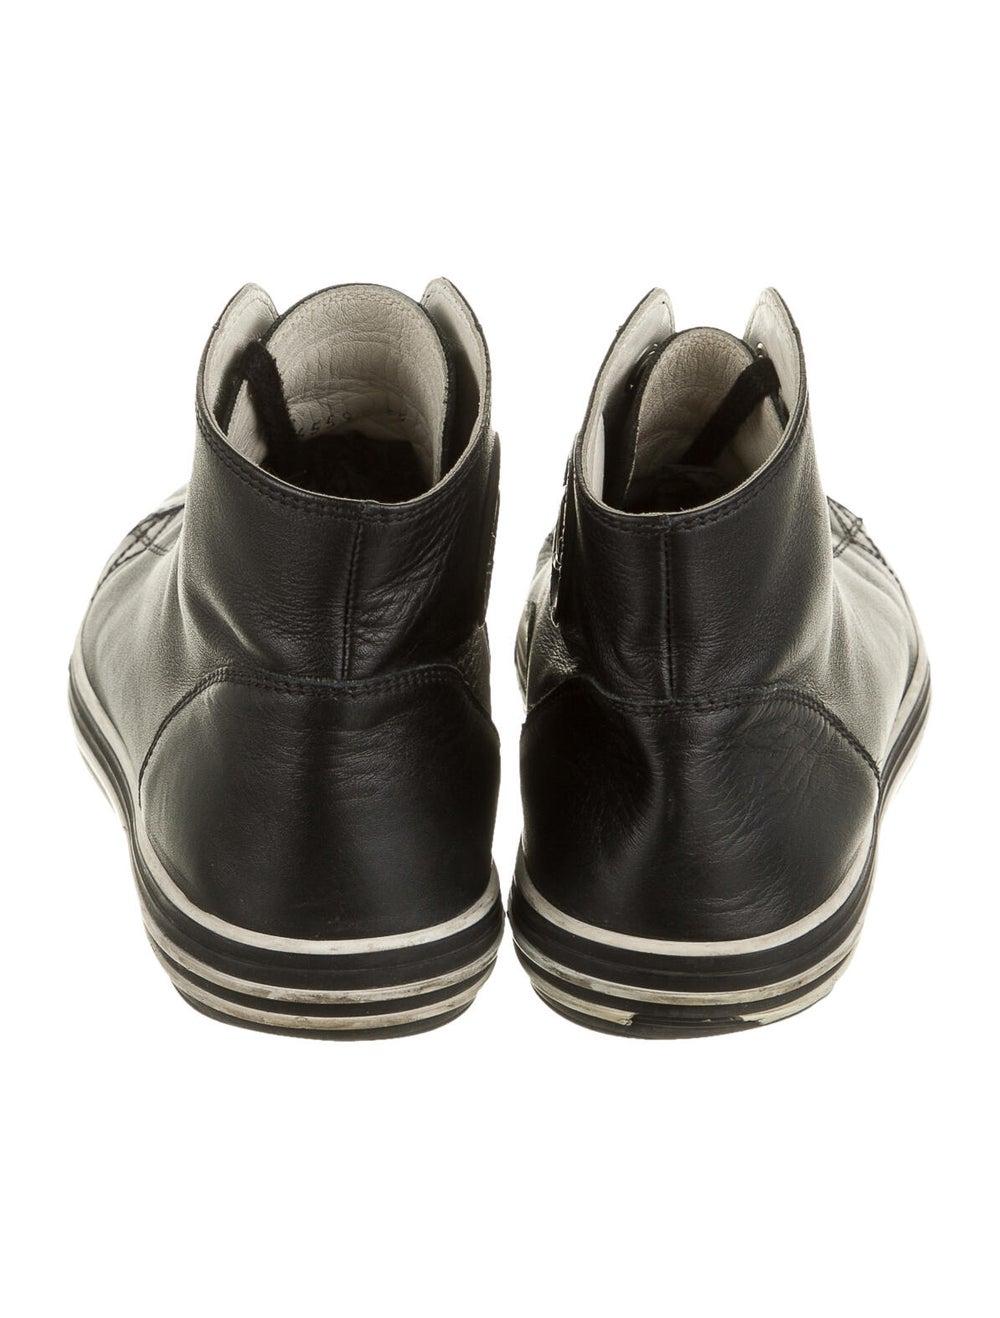 Chanel Interlocking CC Logo Leather Sneakers Black - image 4